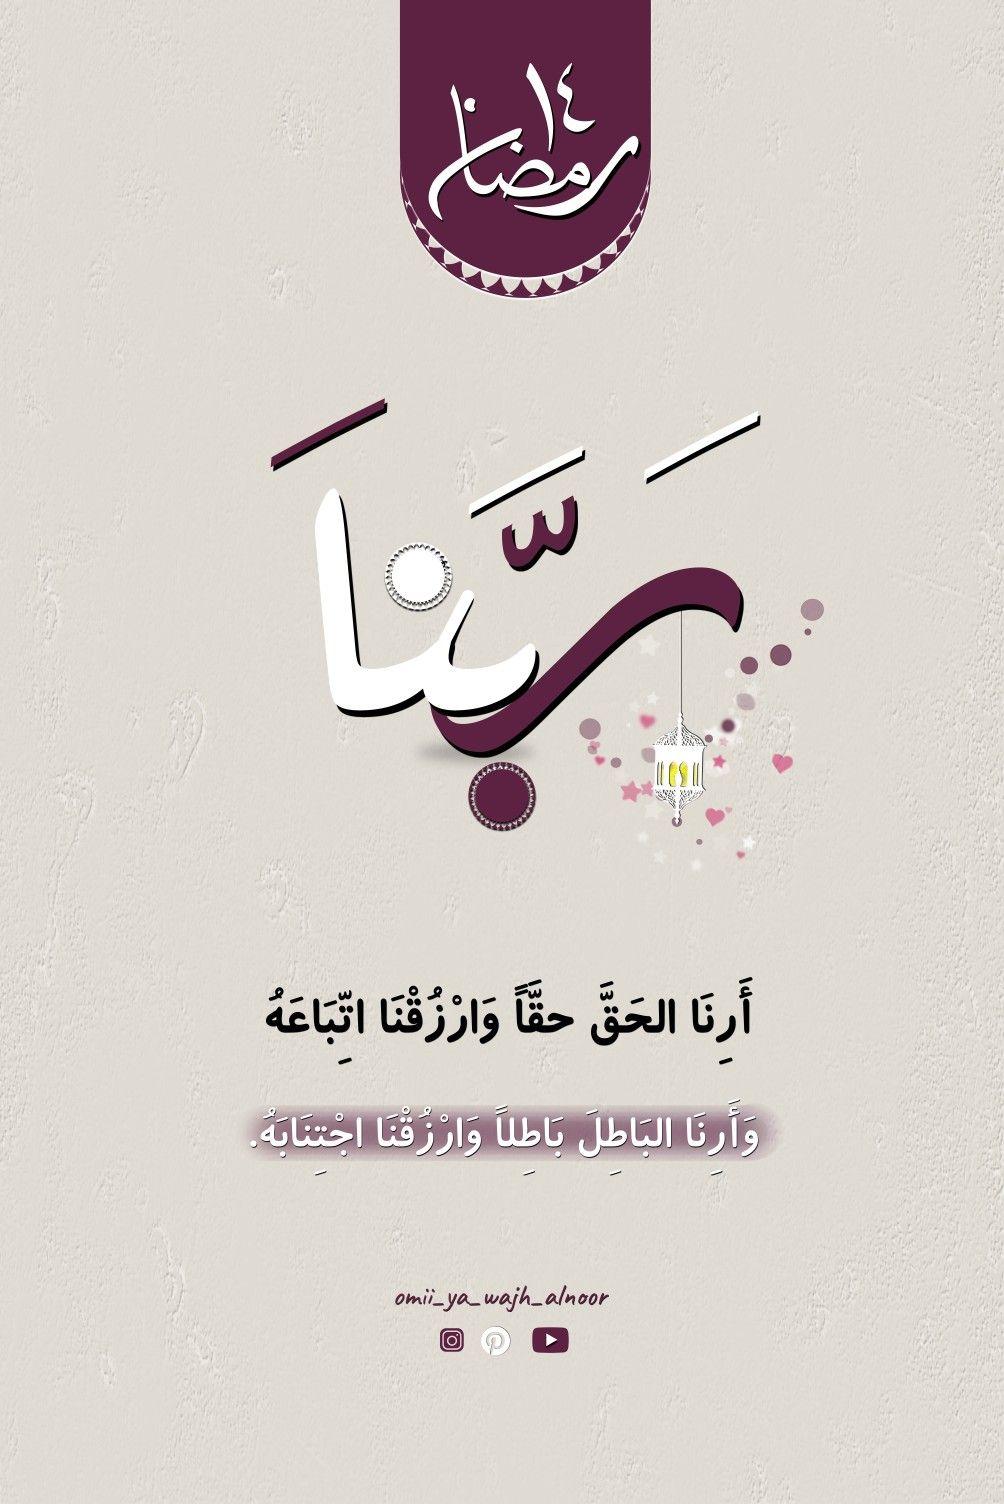 شيلة شهر رمضان اجمل ترحيب بشهر رمضان Neon Signs Youtube Neon